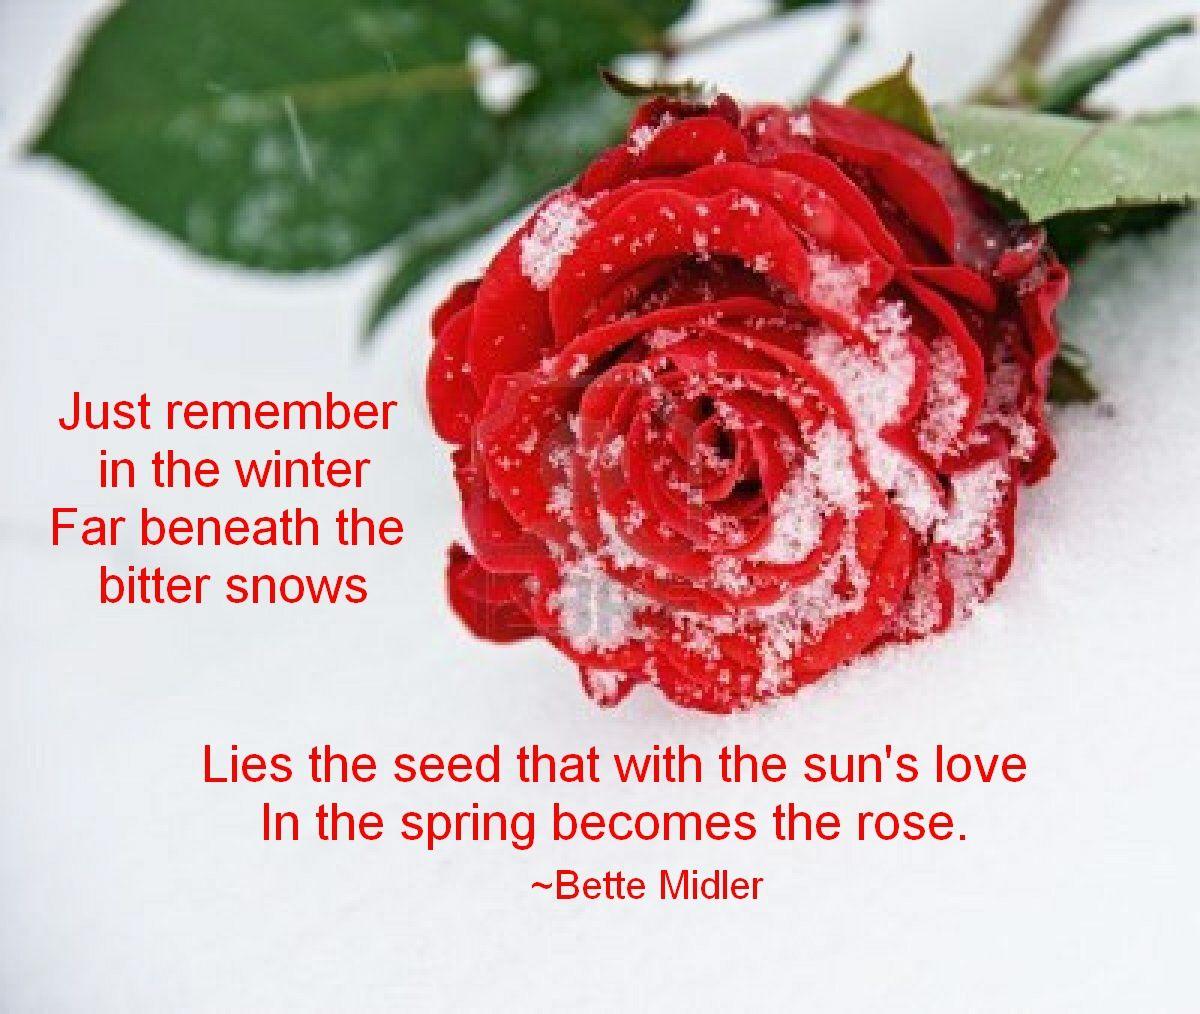 The Rose Bette Midler Quotes Quotesgram Bette Midler Rose Bette